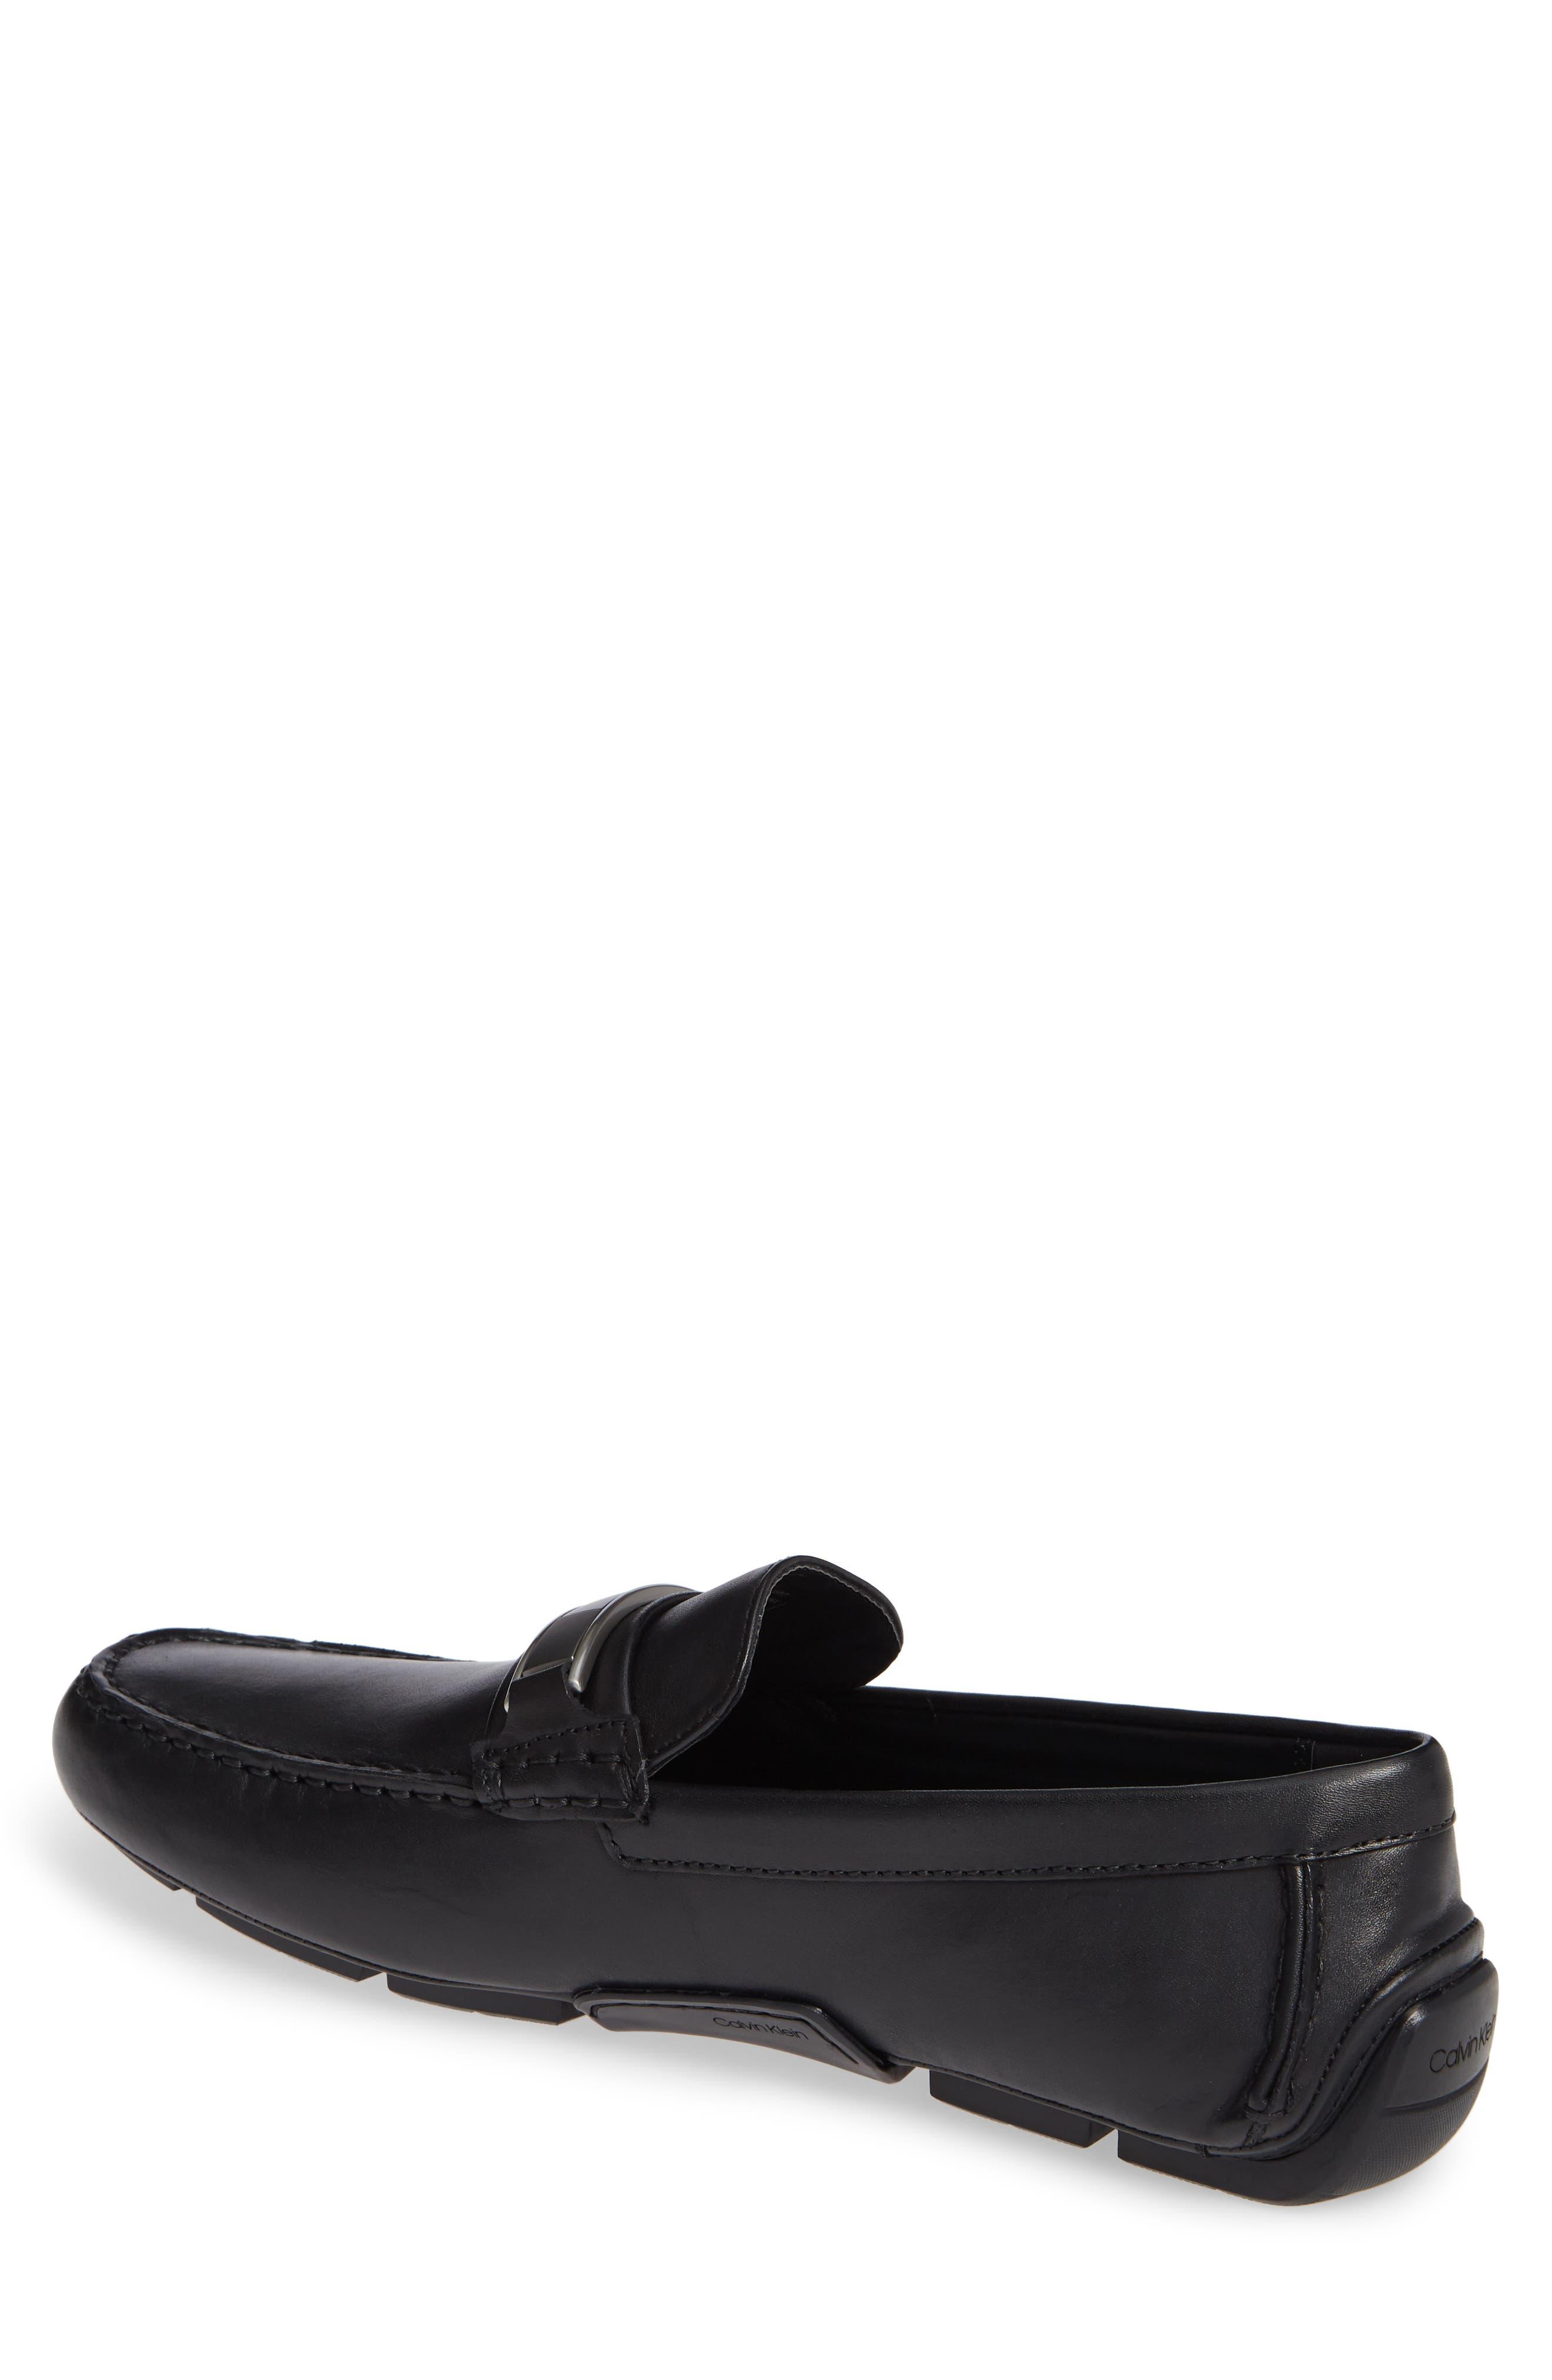 Kadison Buckle Driving Shoe,                             Alternate thumbnail 2, color,                             BLACK LEATHER